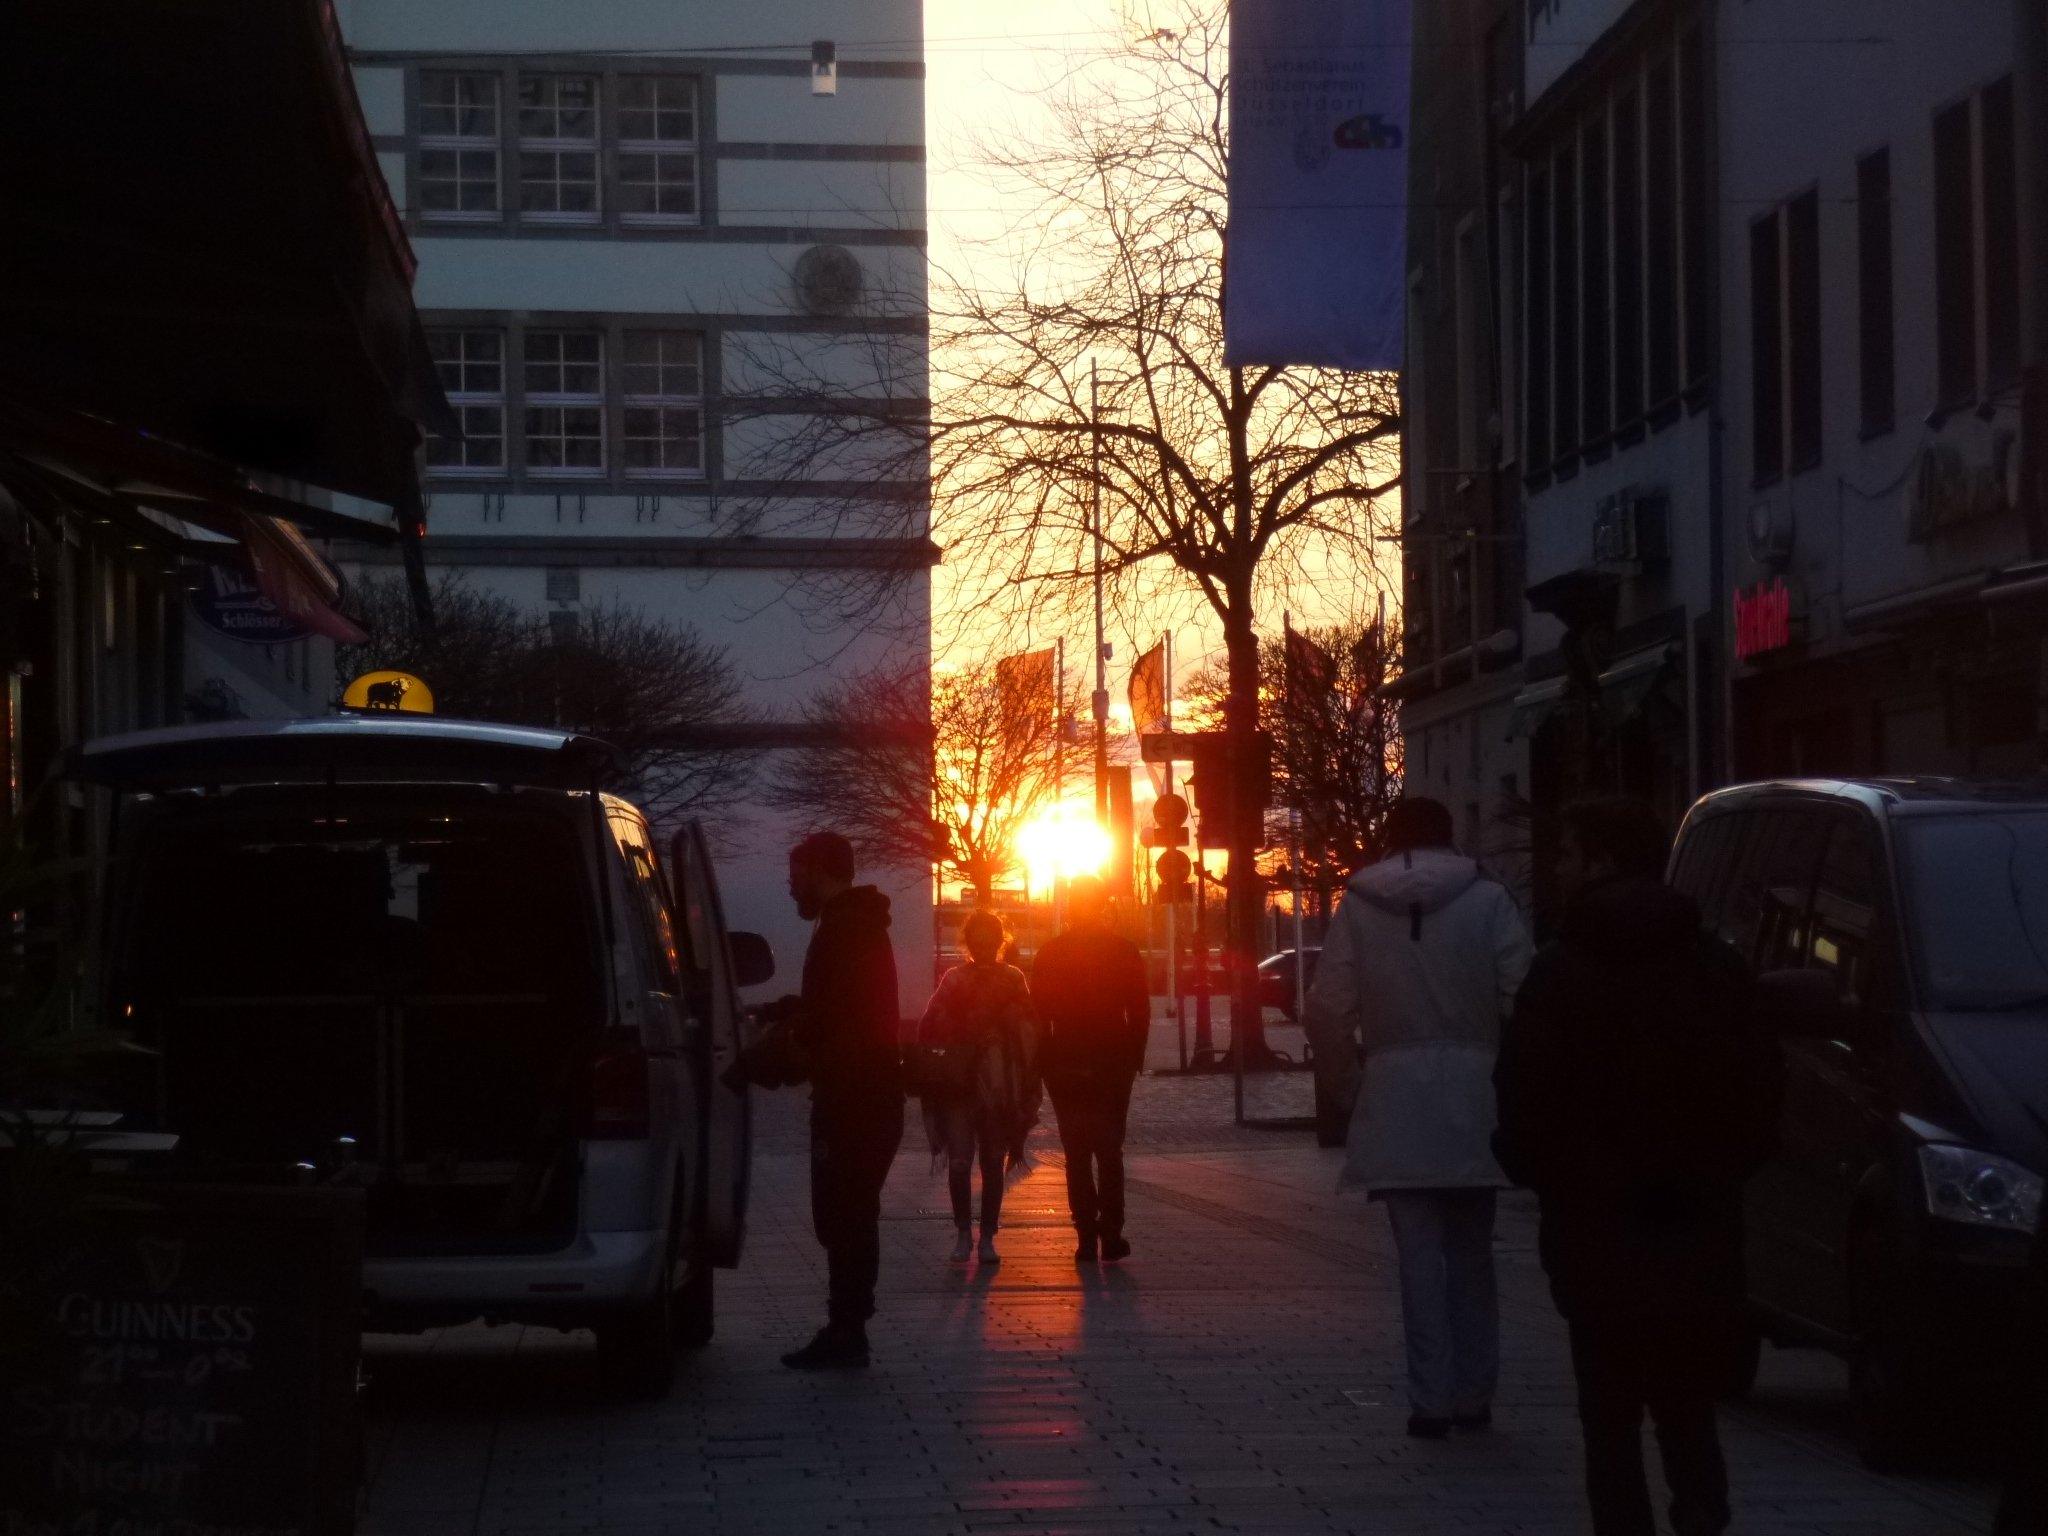 Sonnenuntergang - Altstadt